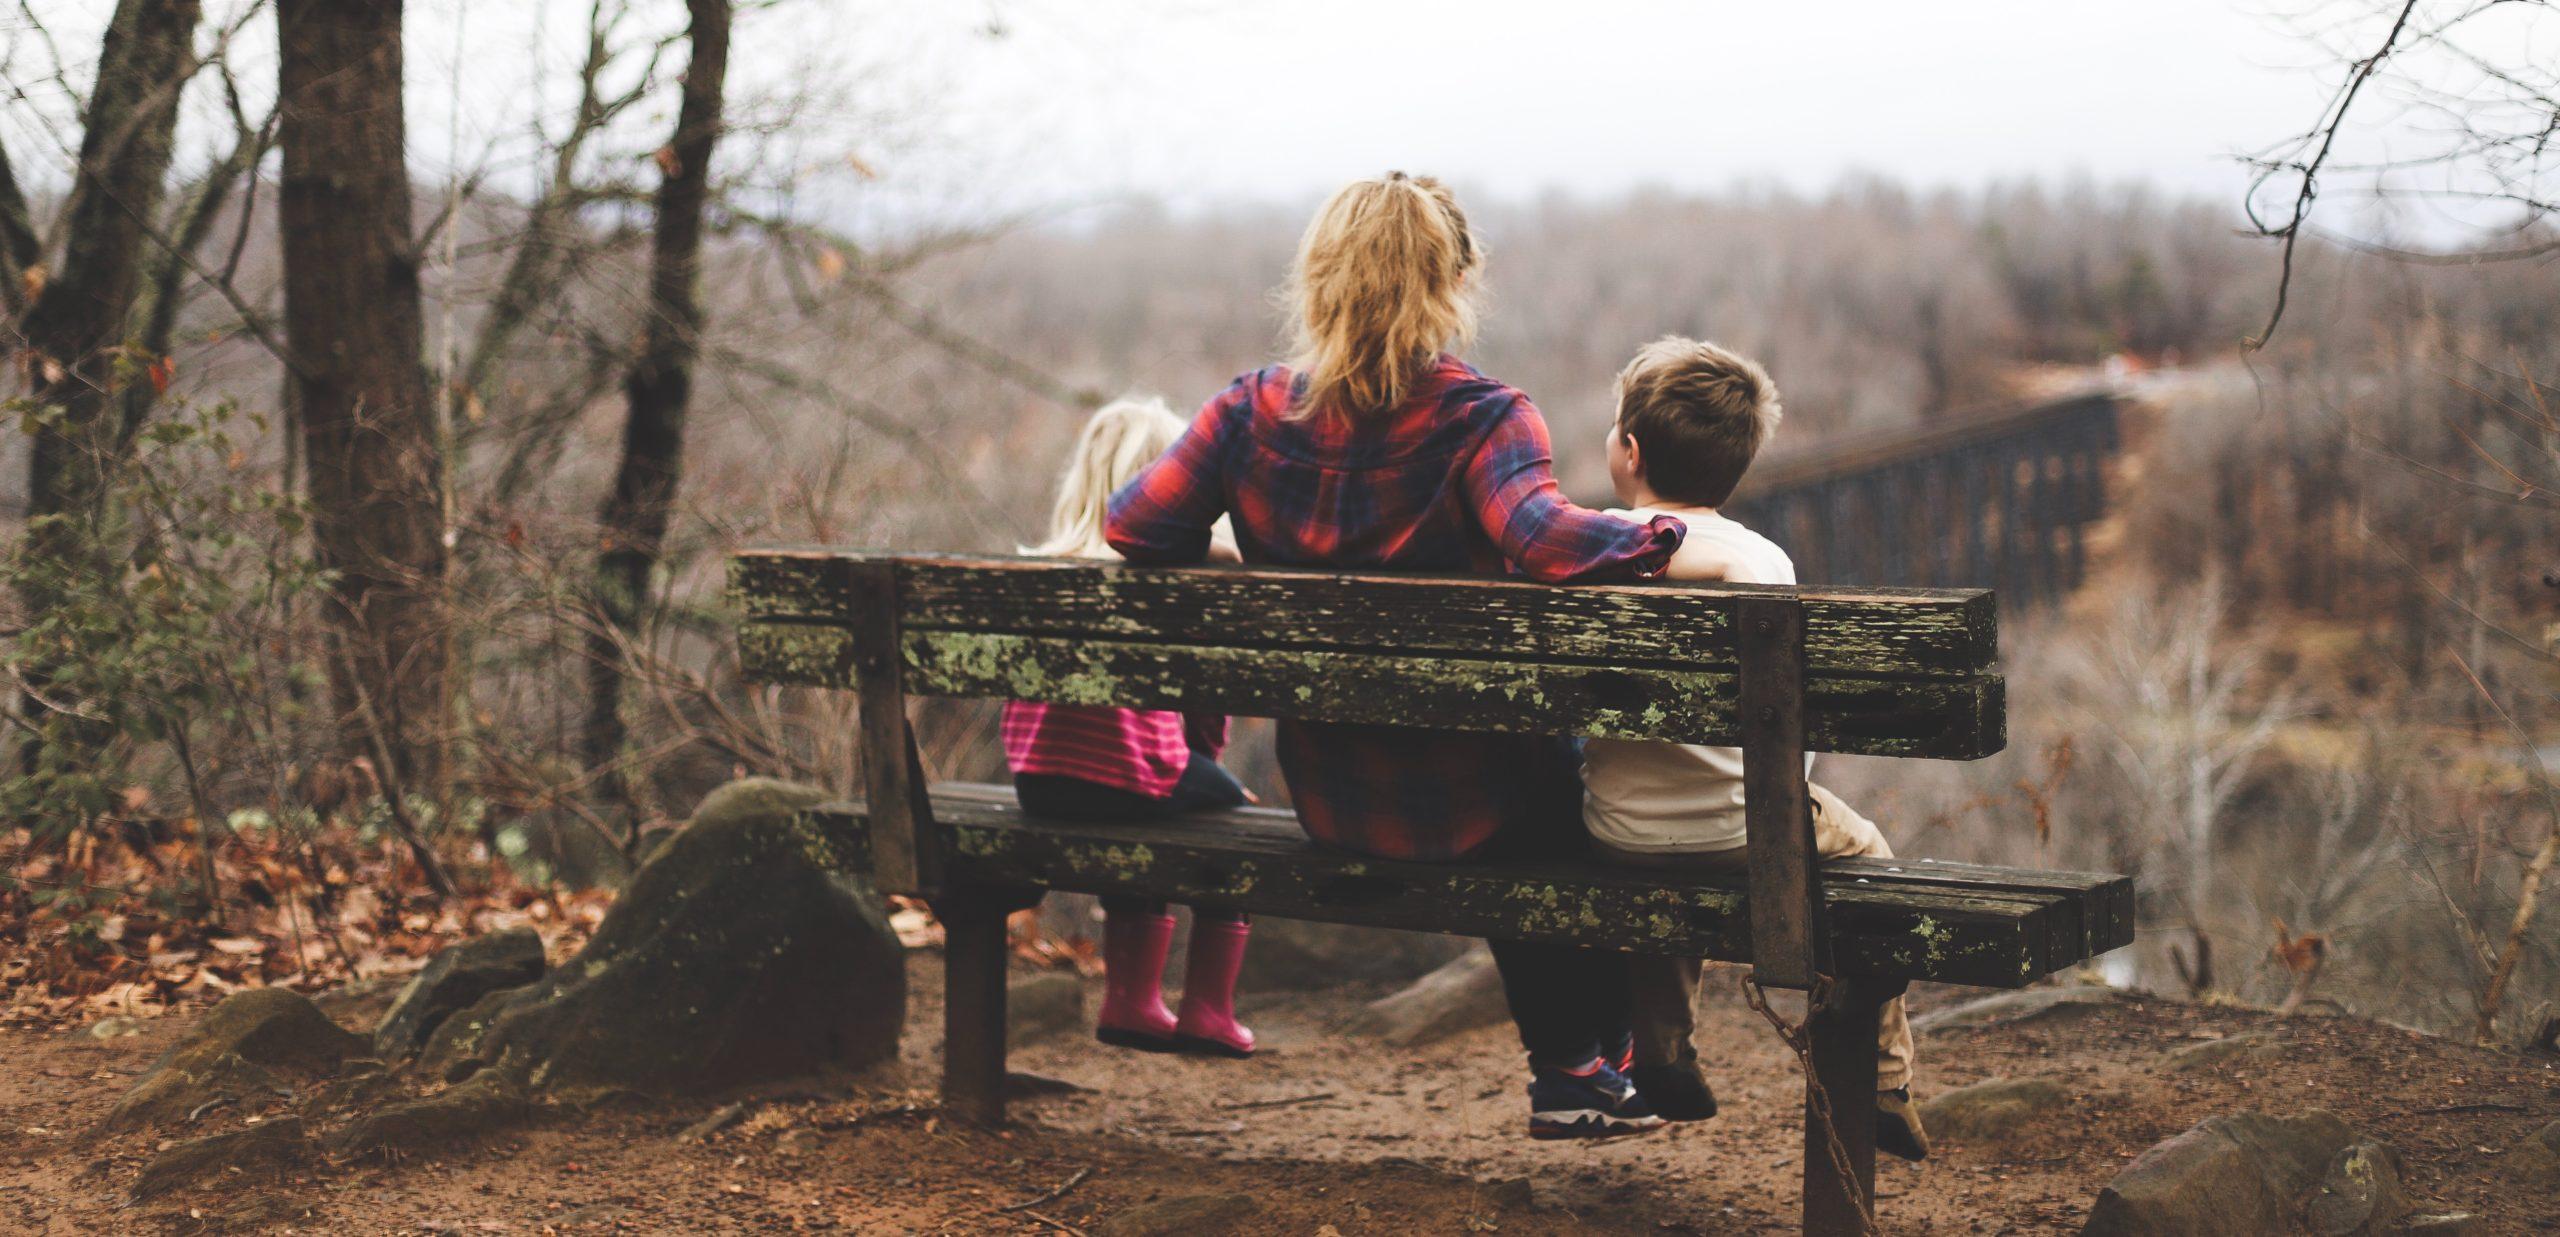 6 Reasons Homeschooling Has Made Me a Better Parent